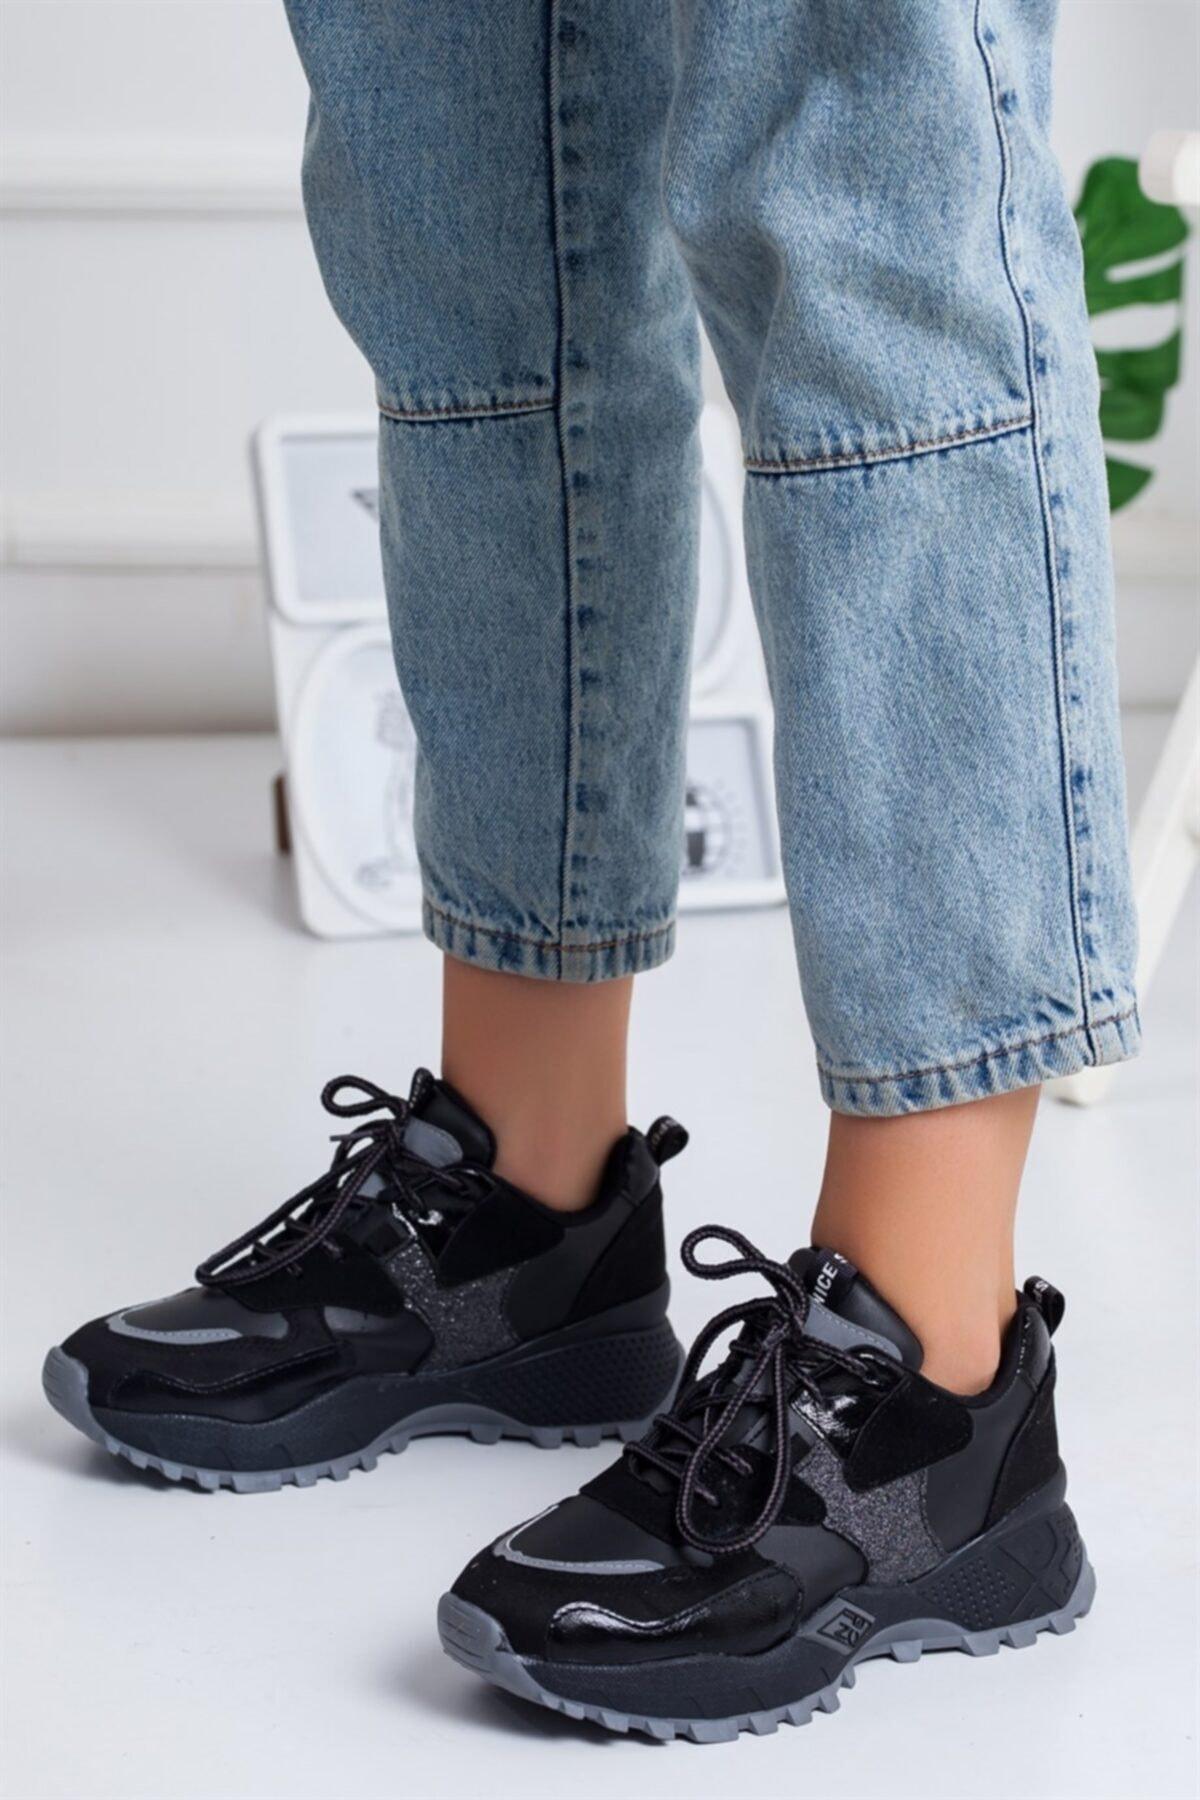 Lovita Shoes Nicci Kadın Sneakers Beyaz